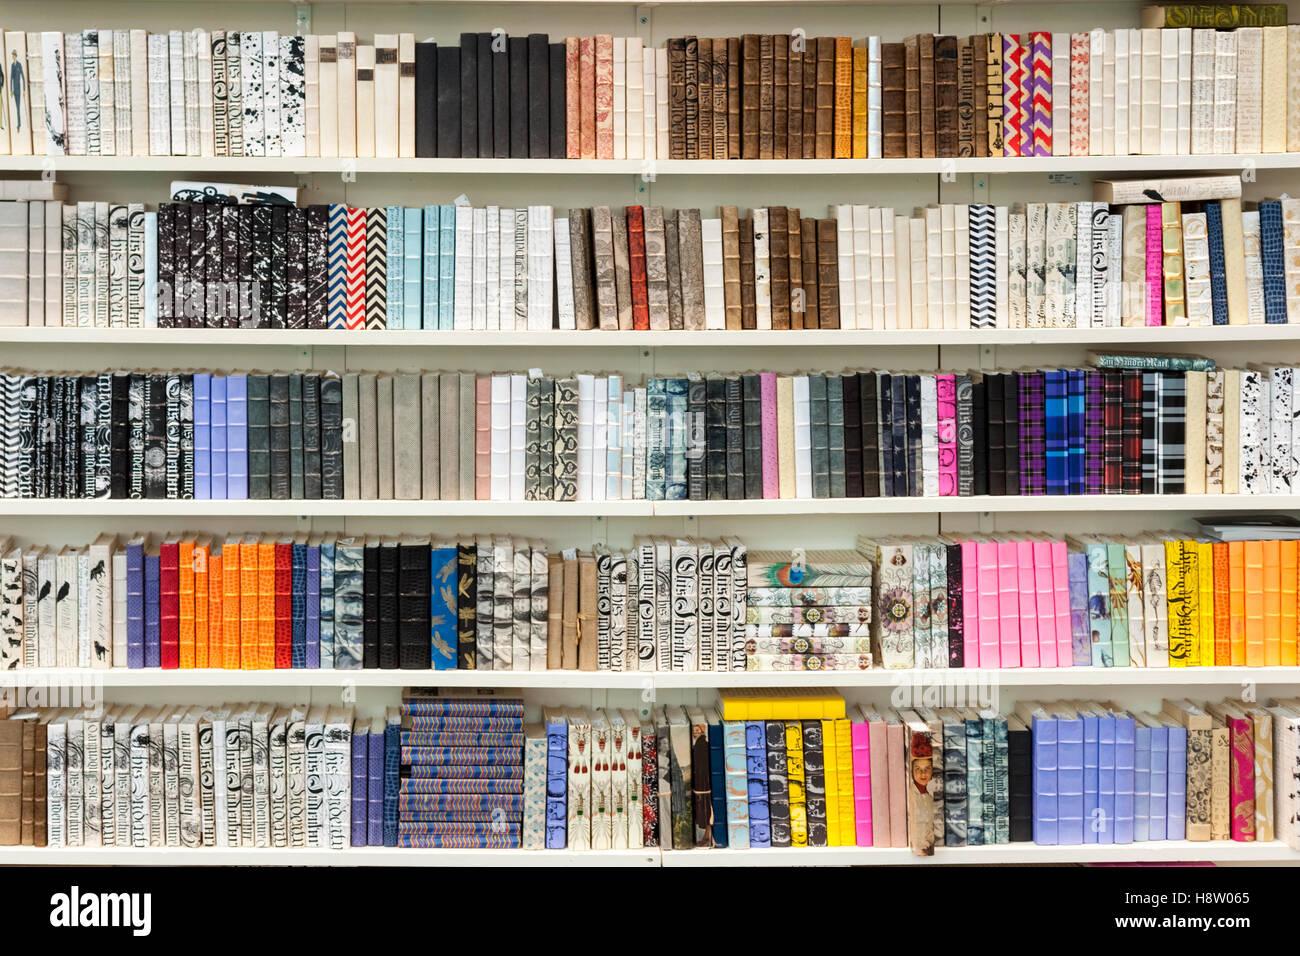 New York City NY USA Bookshelf